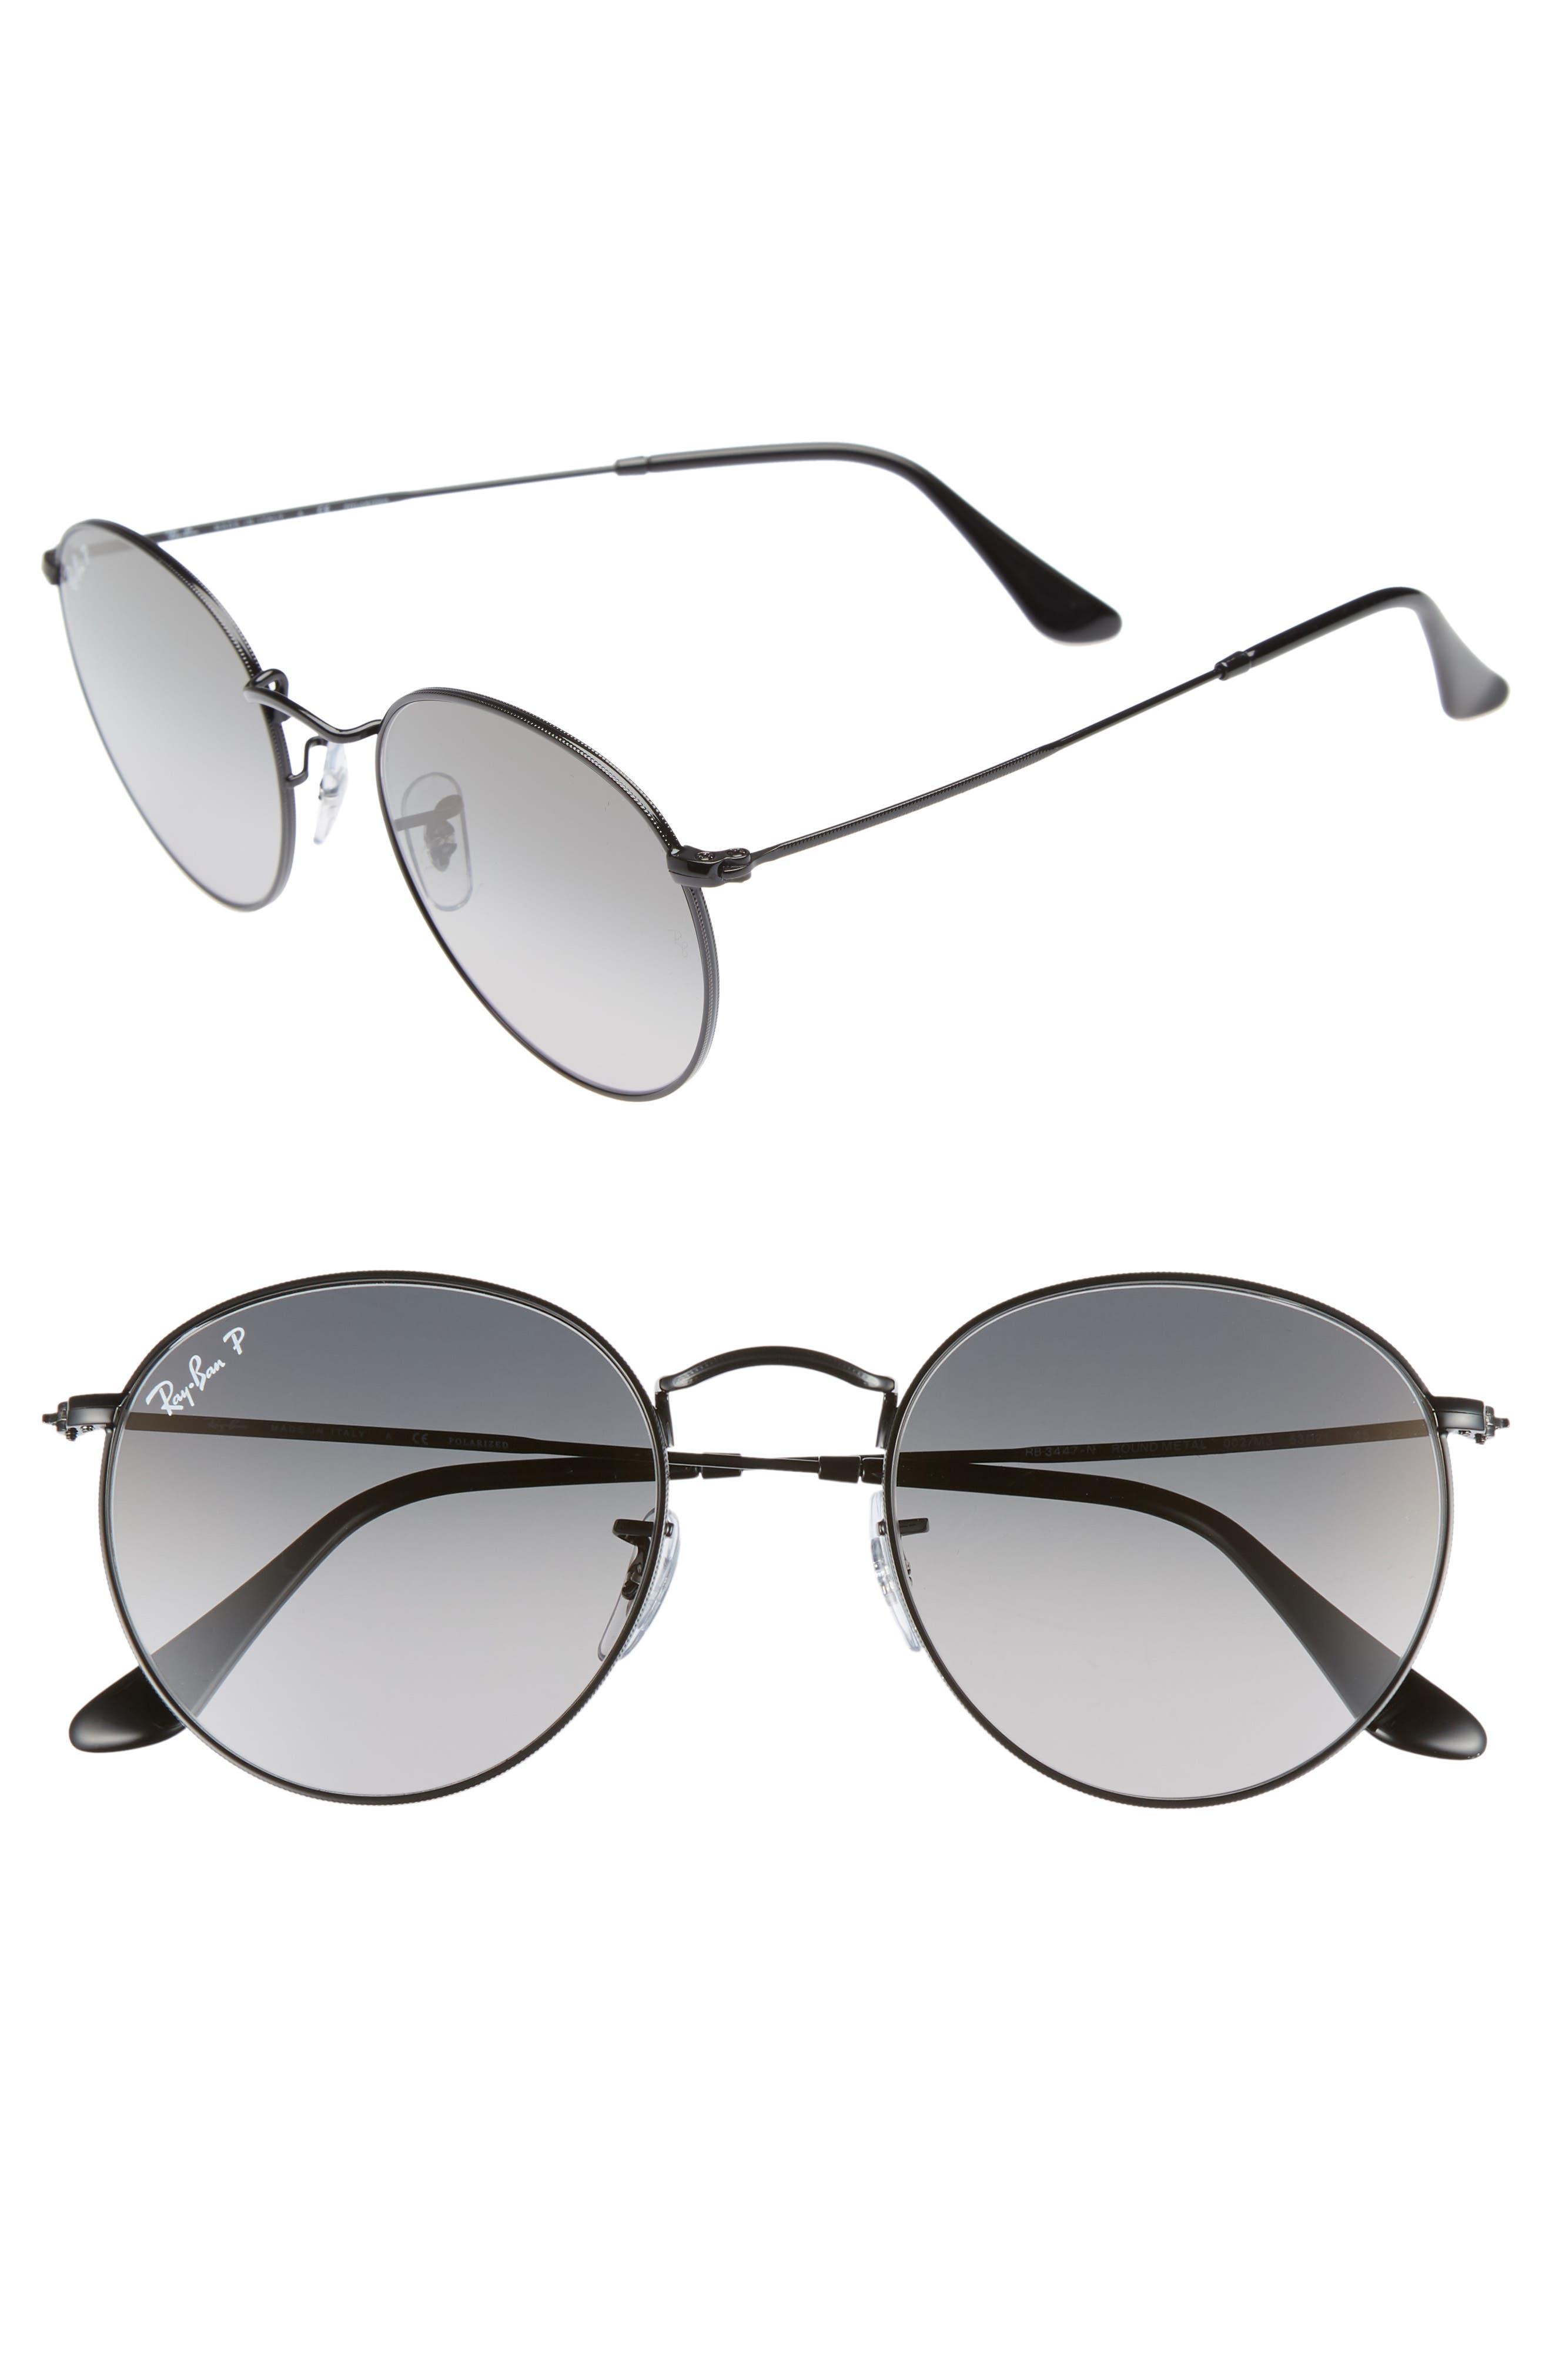 53mm Polarized Round Sunglasses,                             Main thumbnail 1, color,                             BLACK / GREY